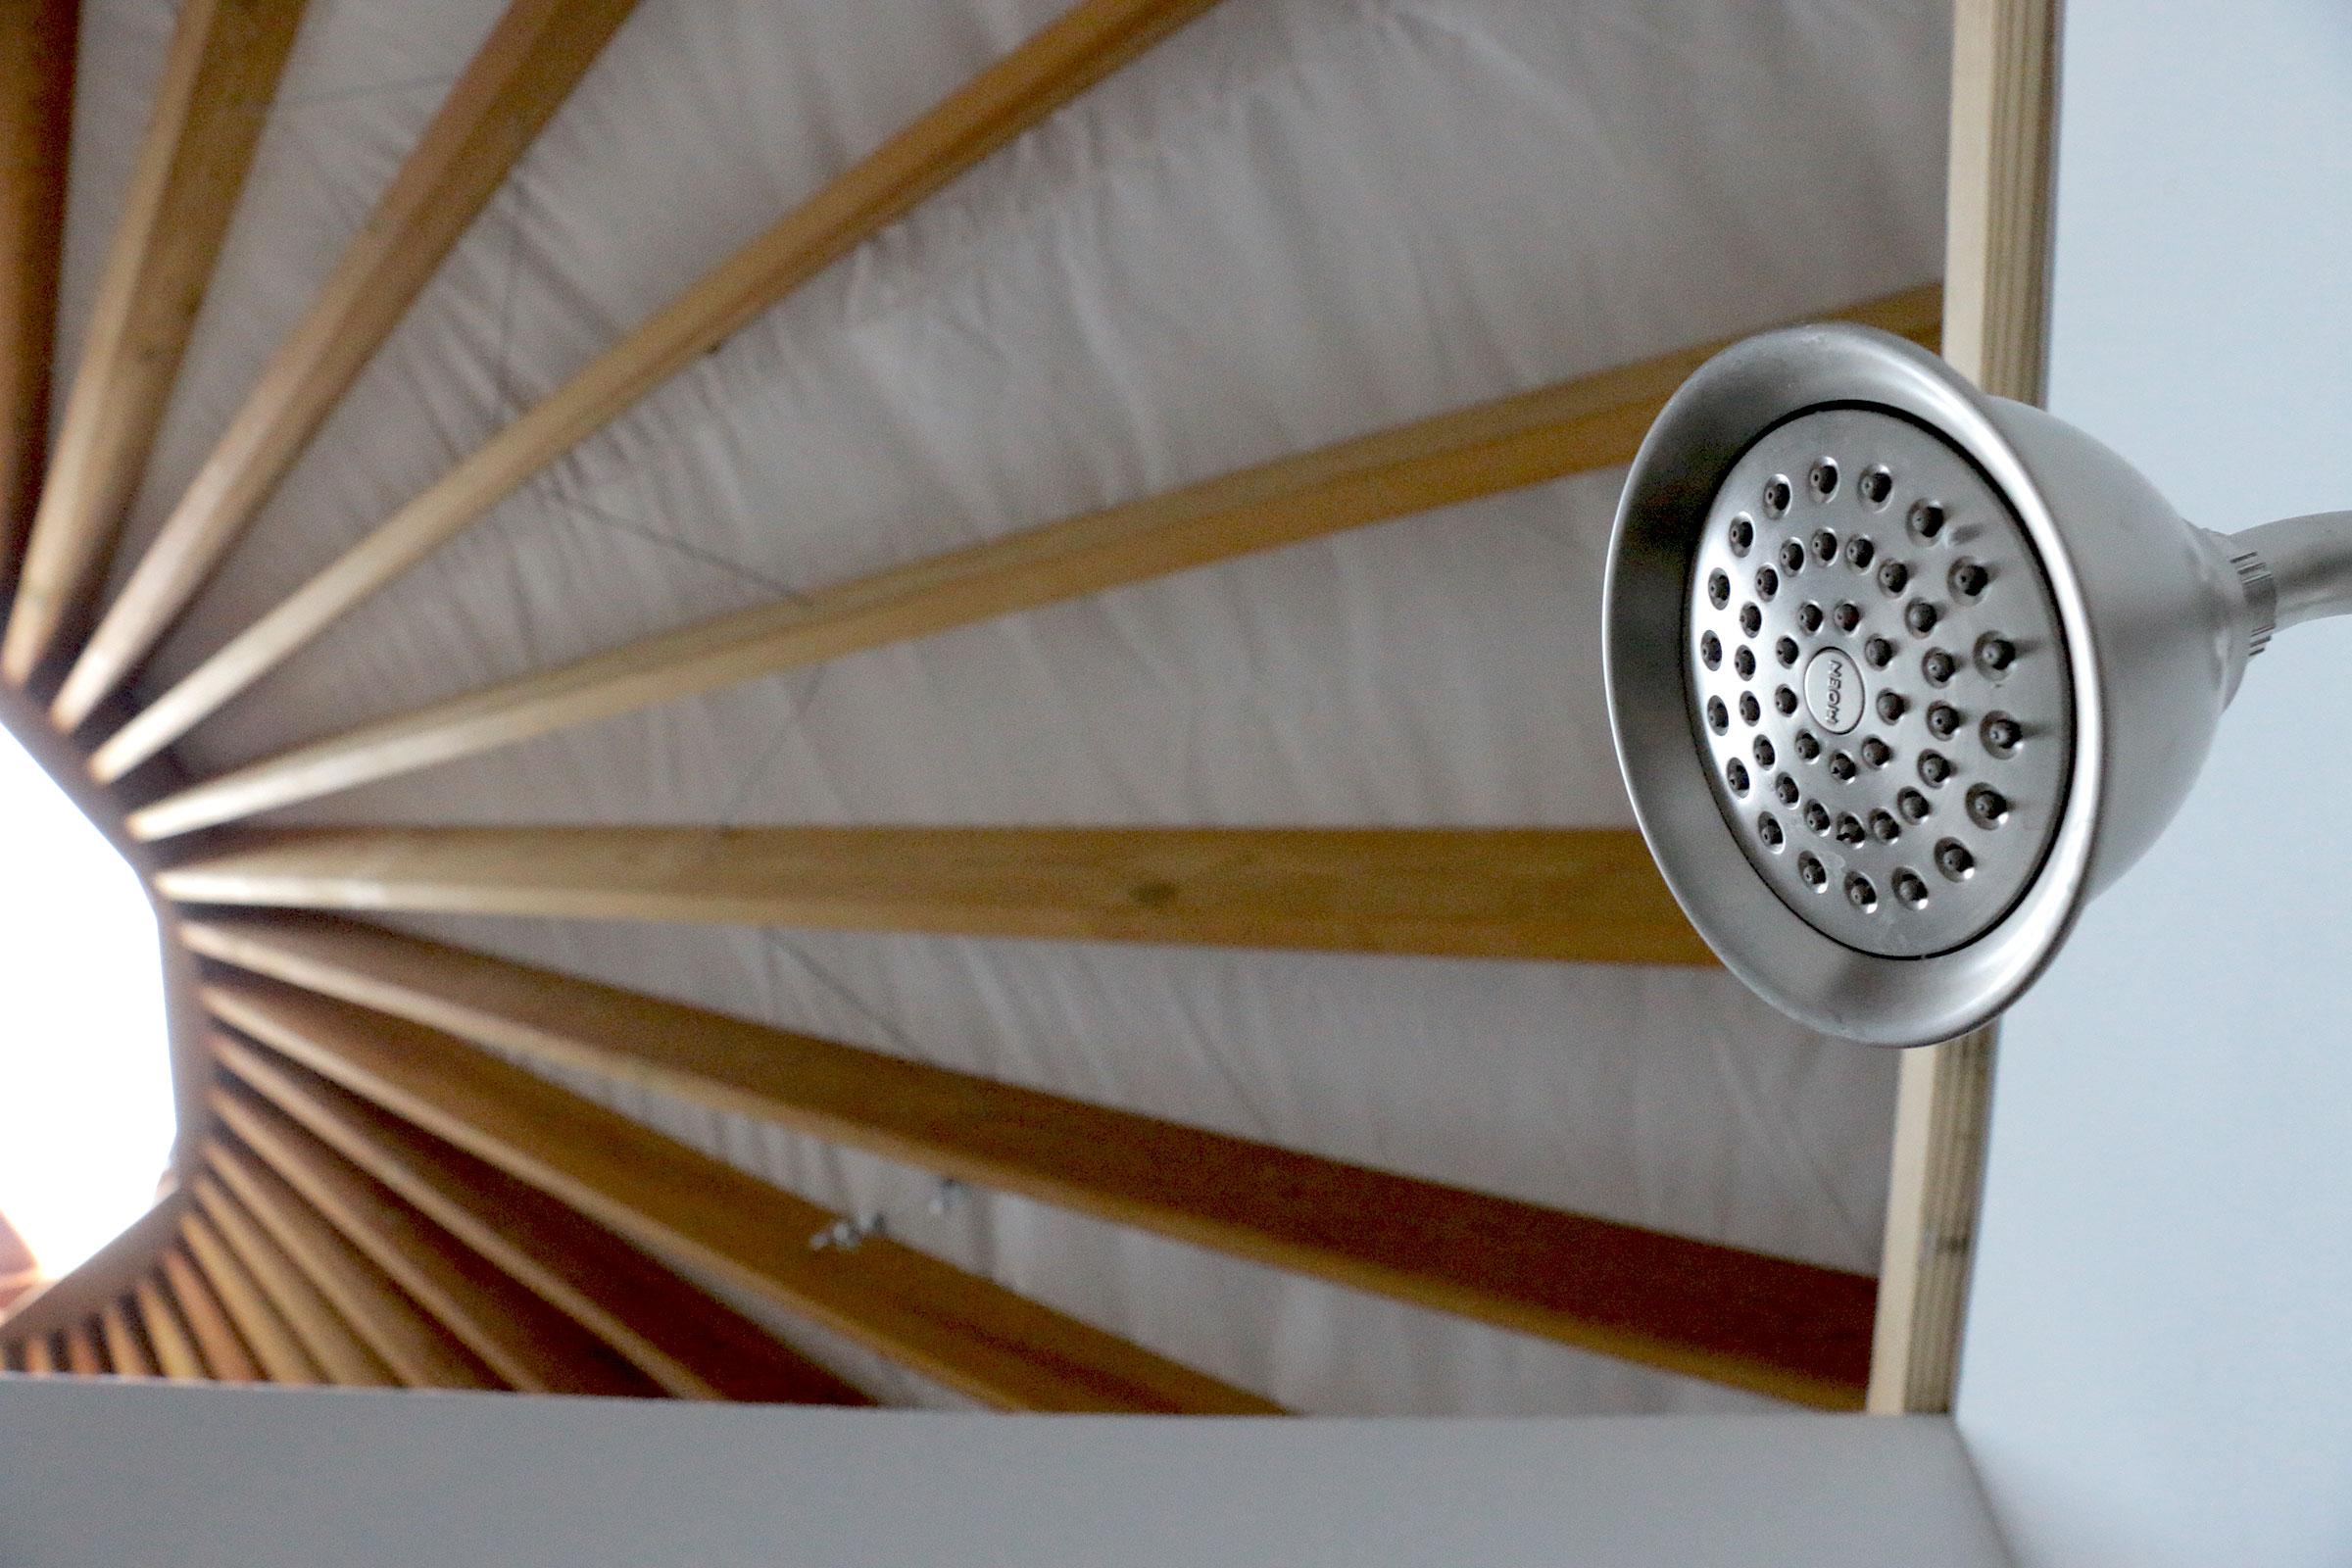 ShowerSky_2226.jpg